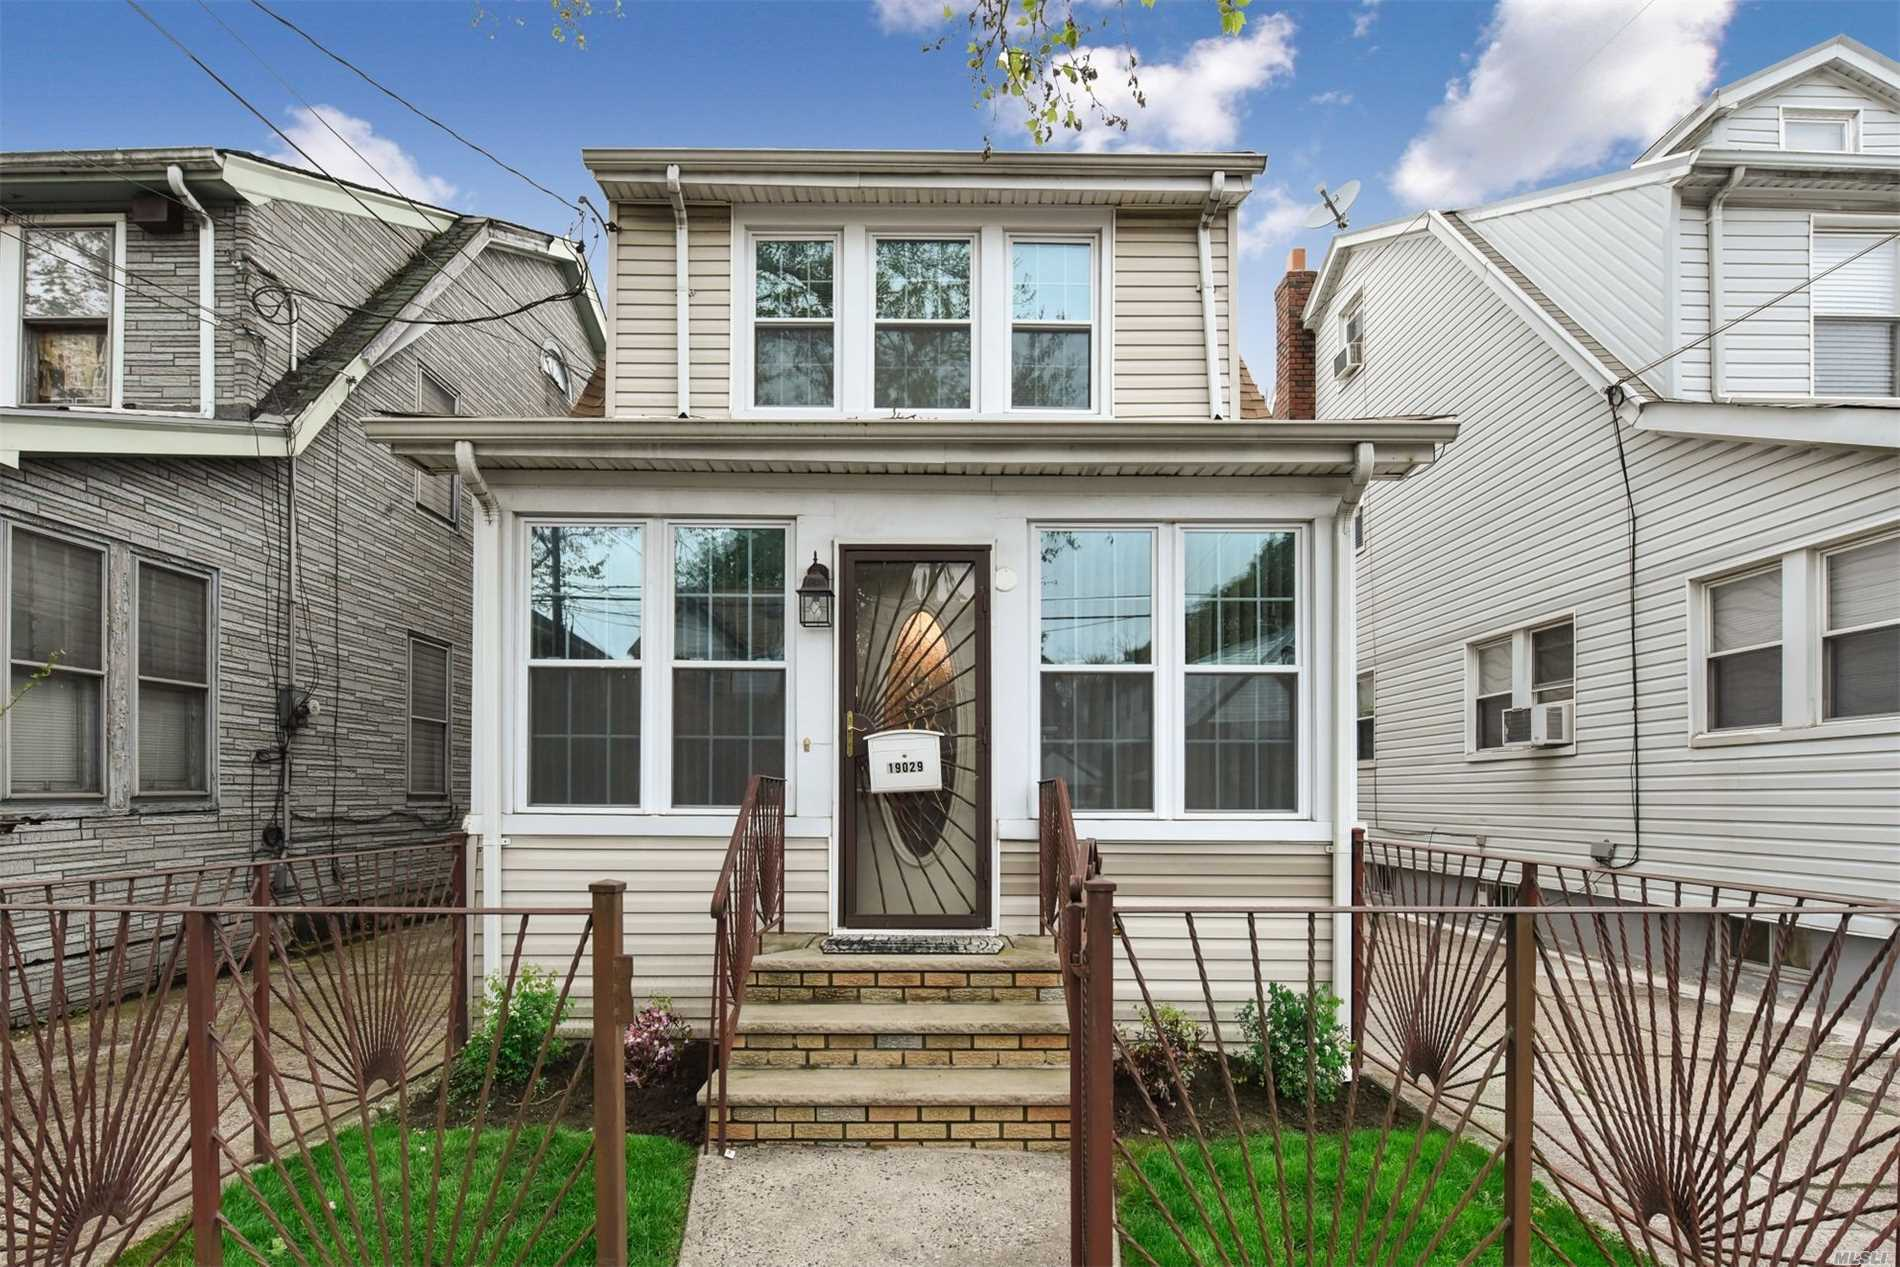 190-29 117th Rd Saint Albans, NY 11412